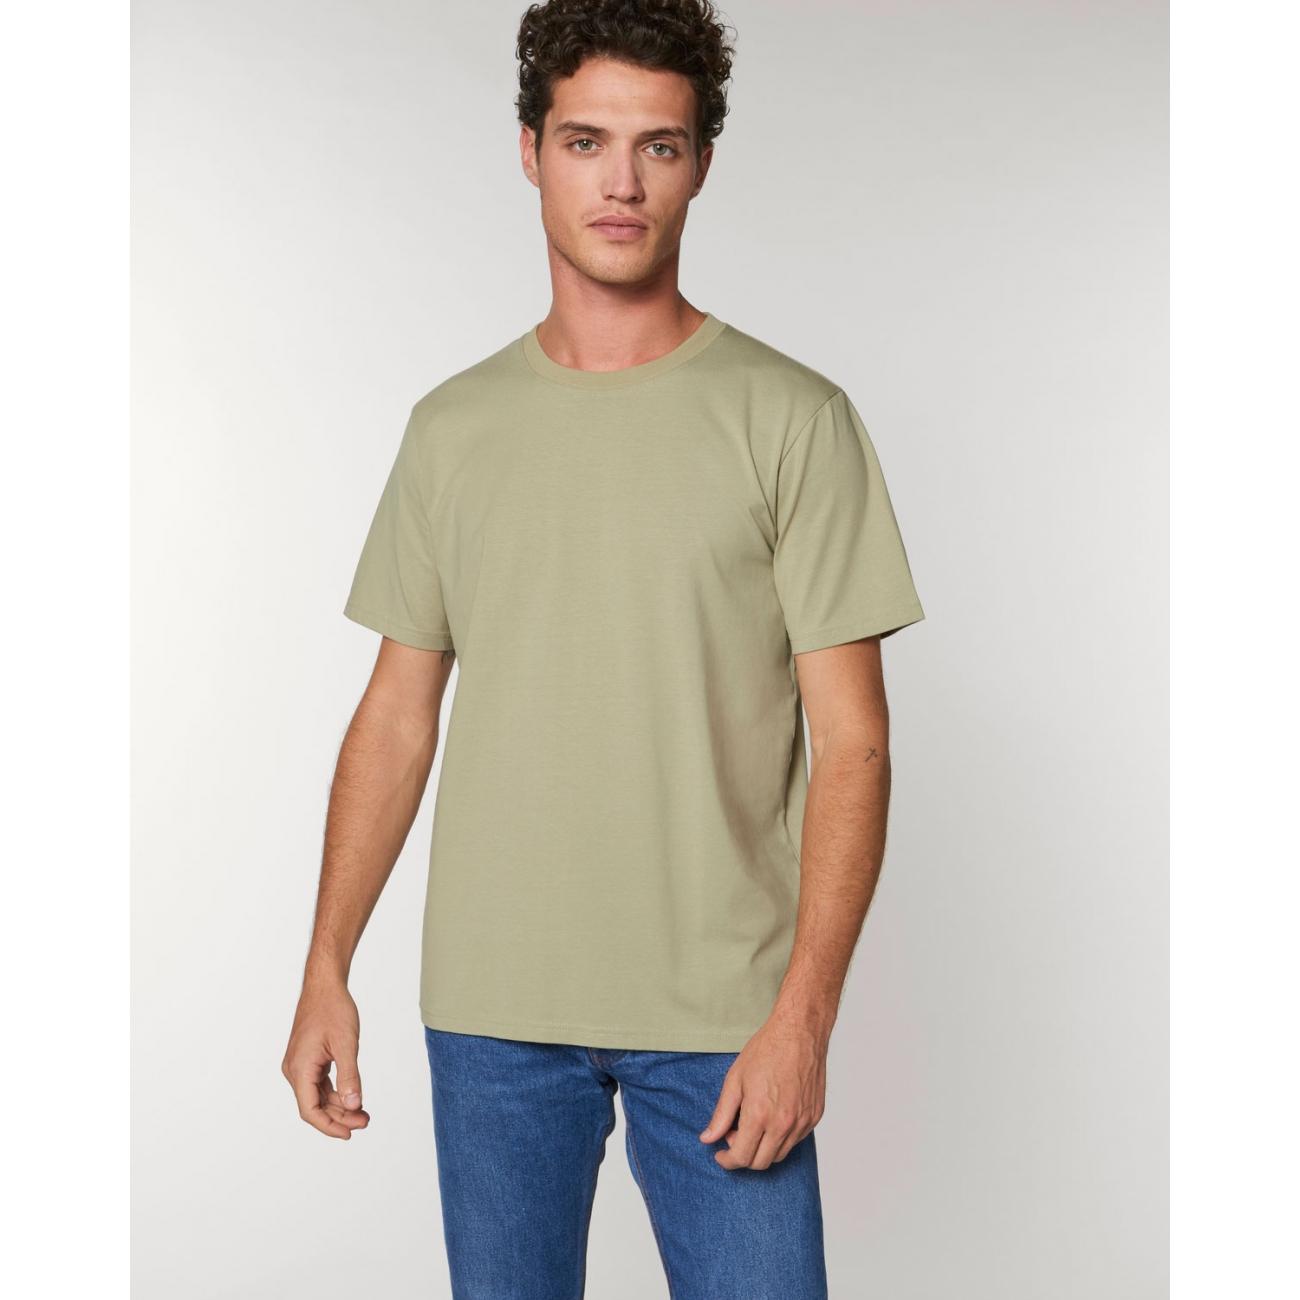 https://tee-shirt-bio.com/10233-thickbox_default/tee-shirt-homme-epais-220g-coton-bio-vert-sauge.jpg